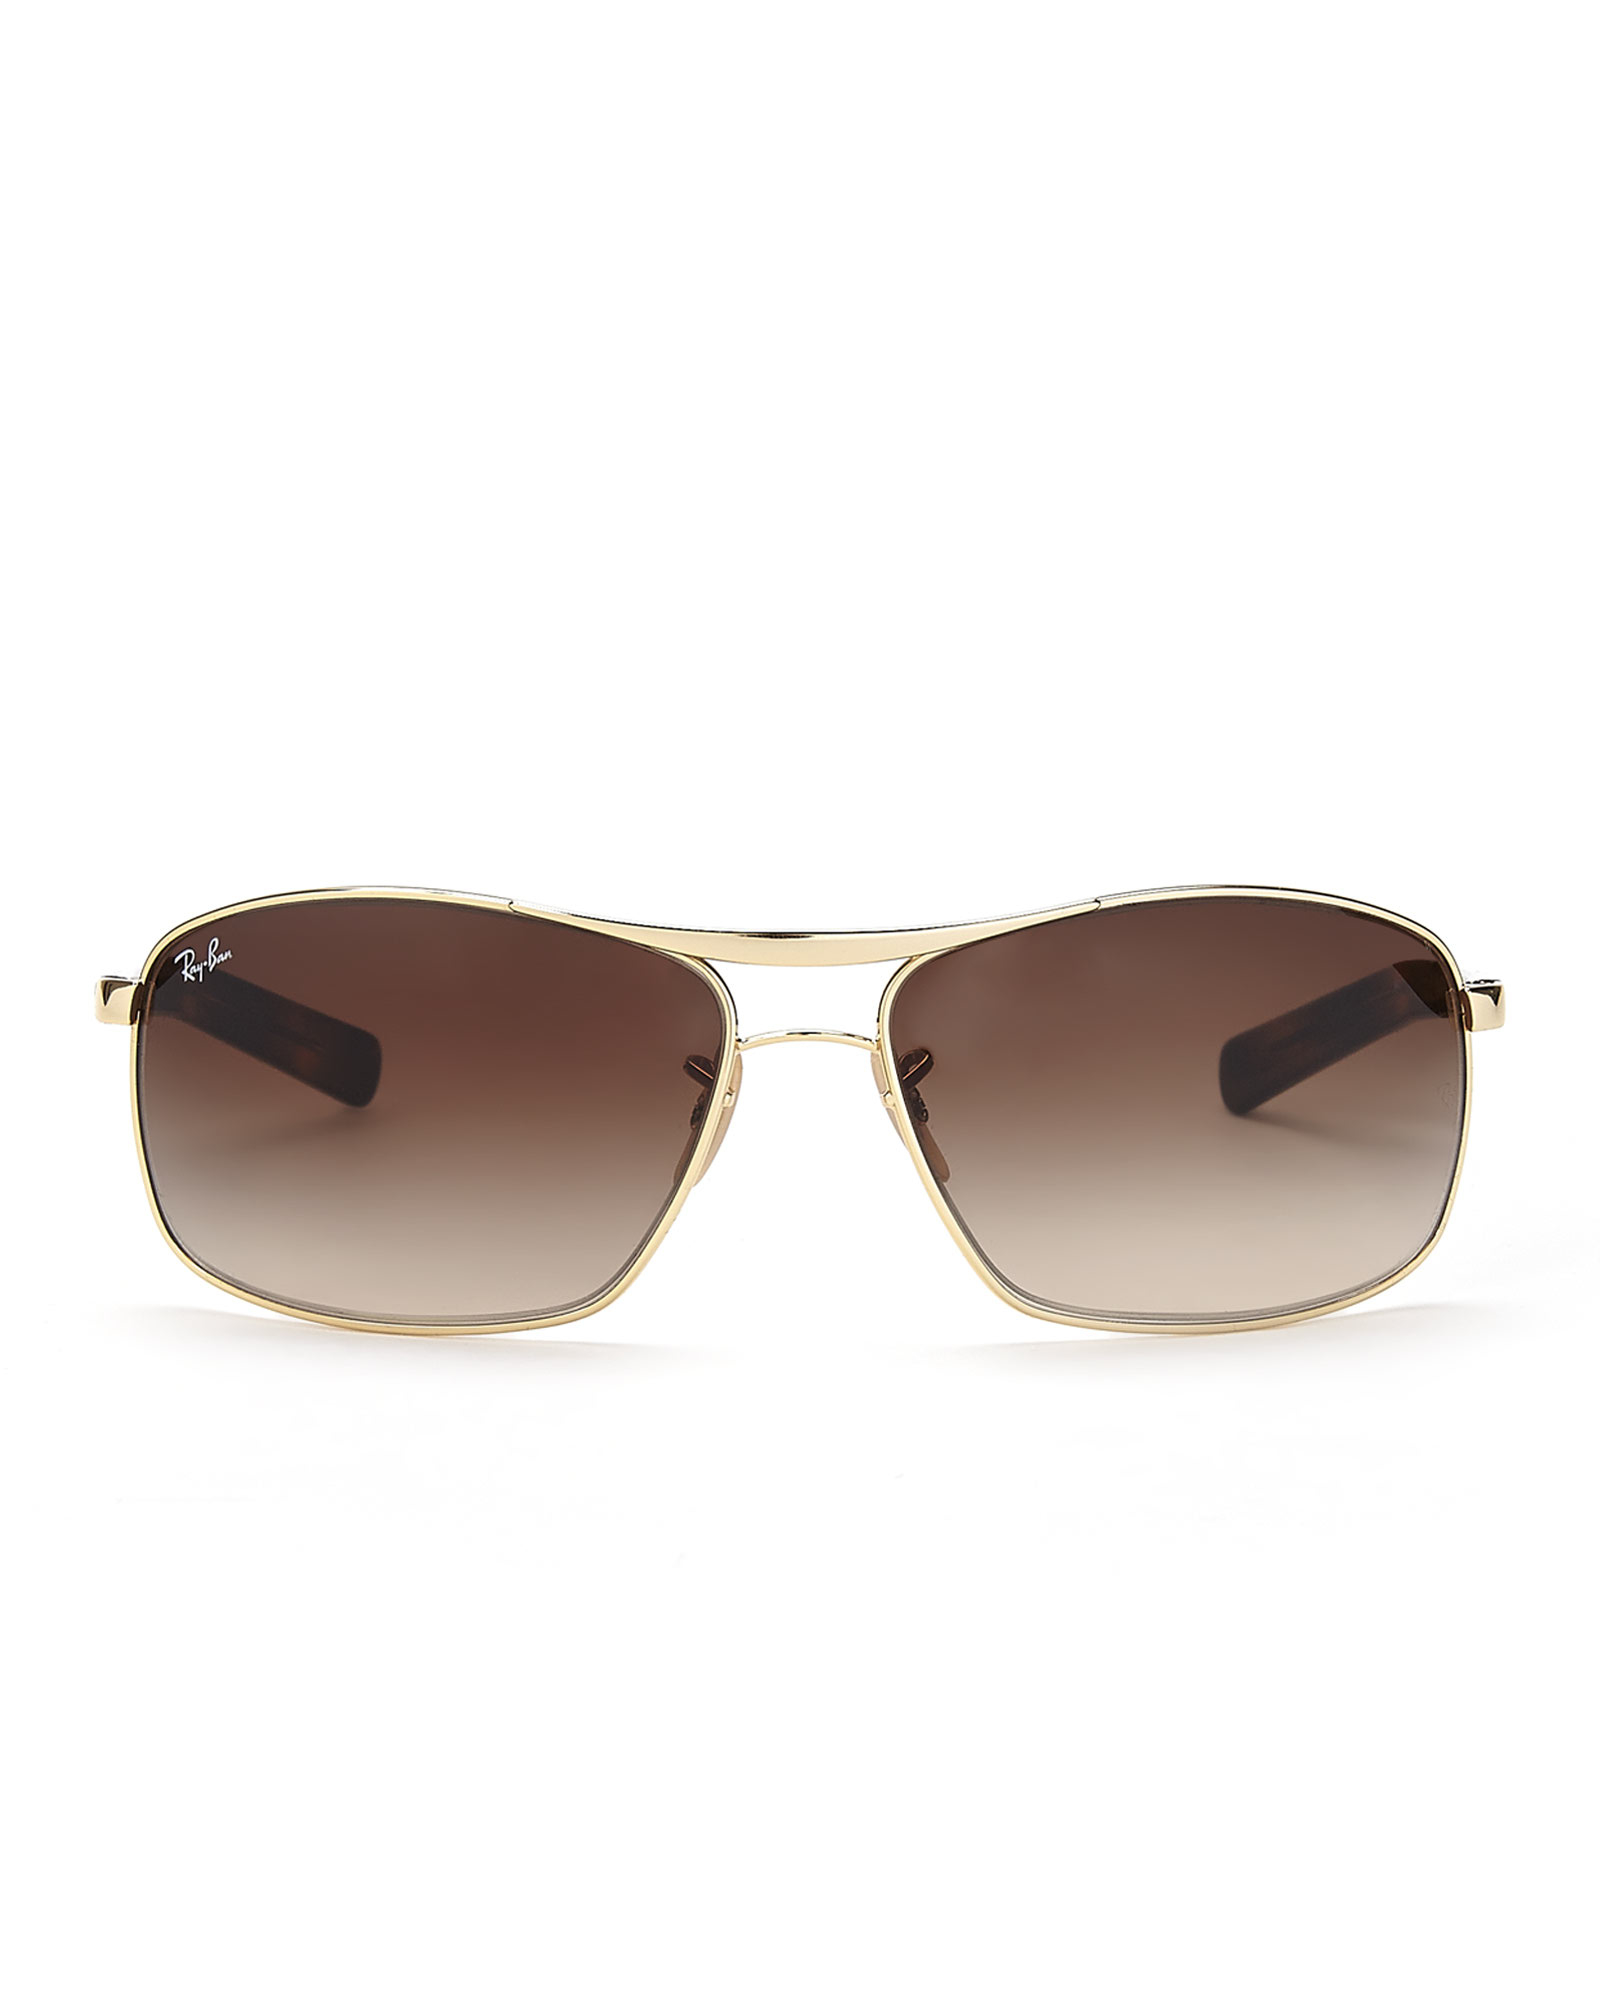 272ad82a9c Ray-Ban Metallic Gold-Tone Rb3470 Navigator Sunglasses for men